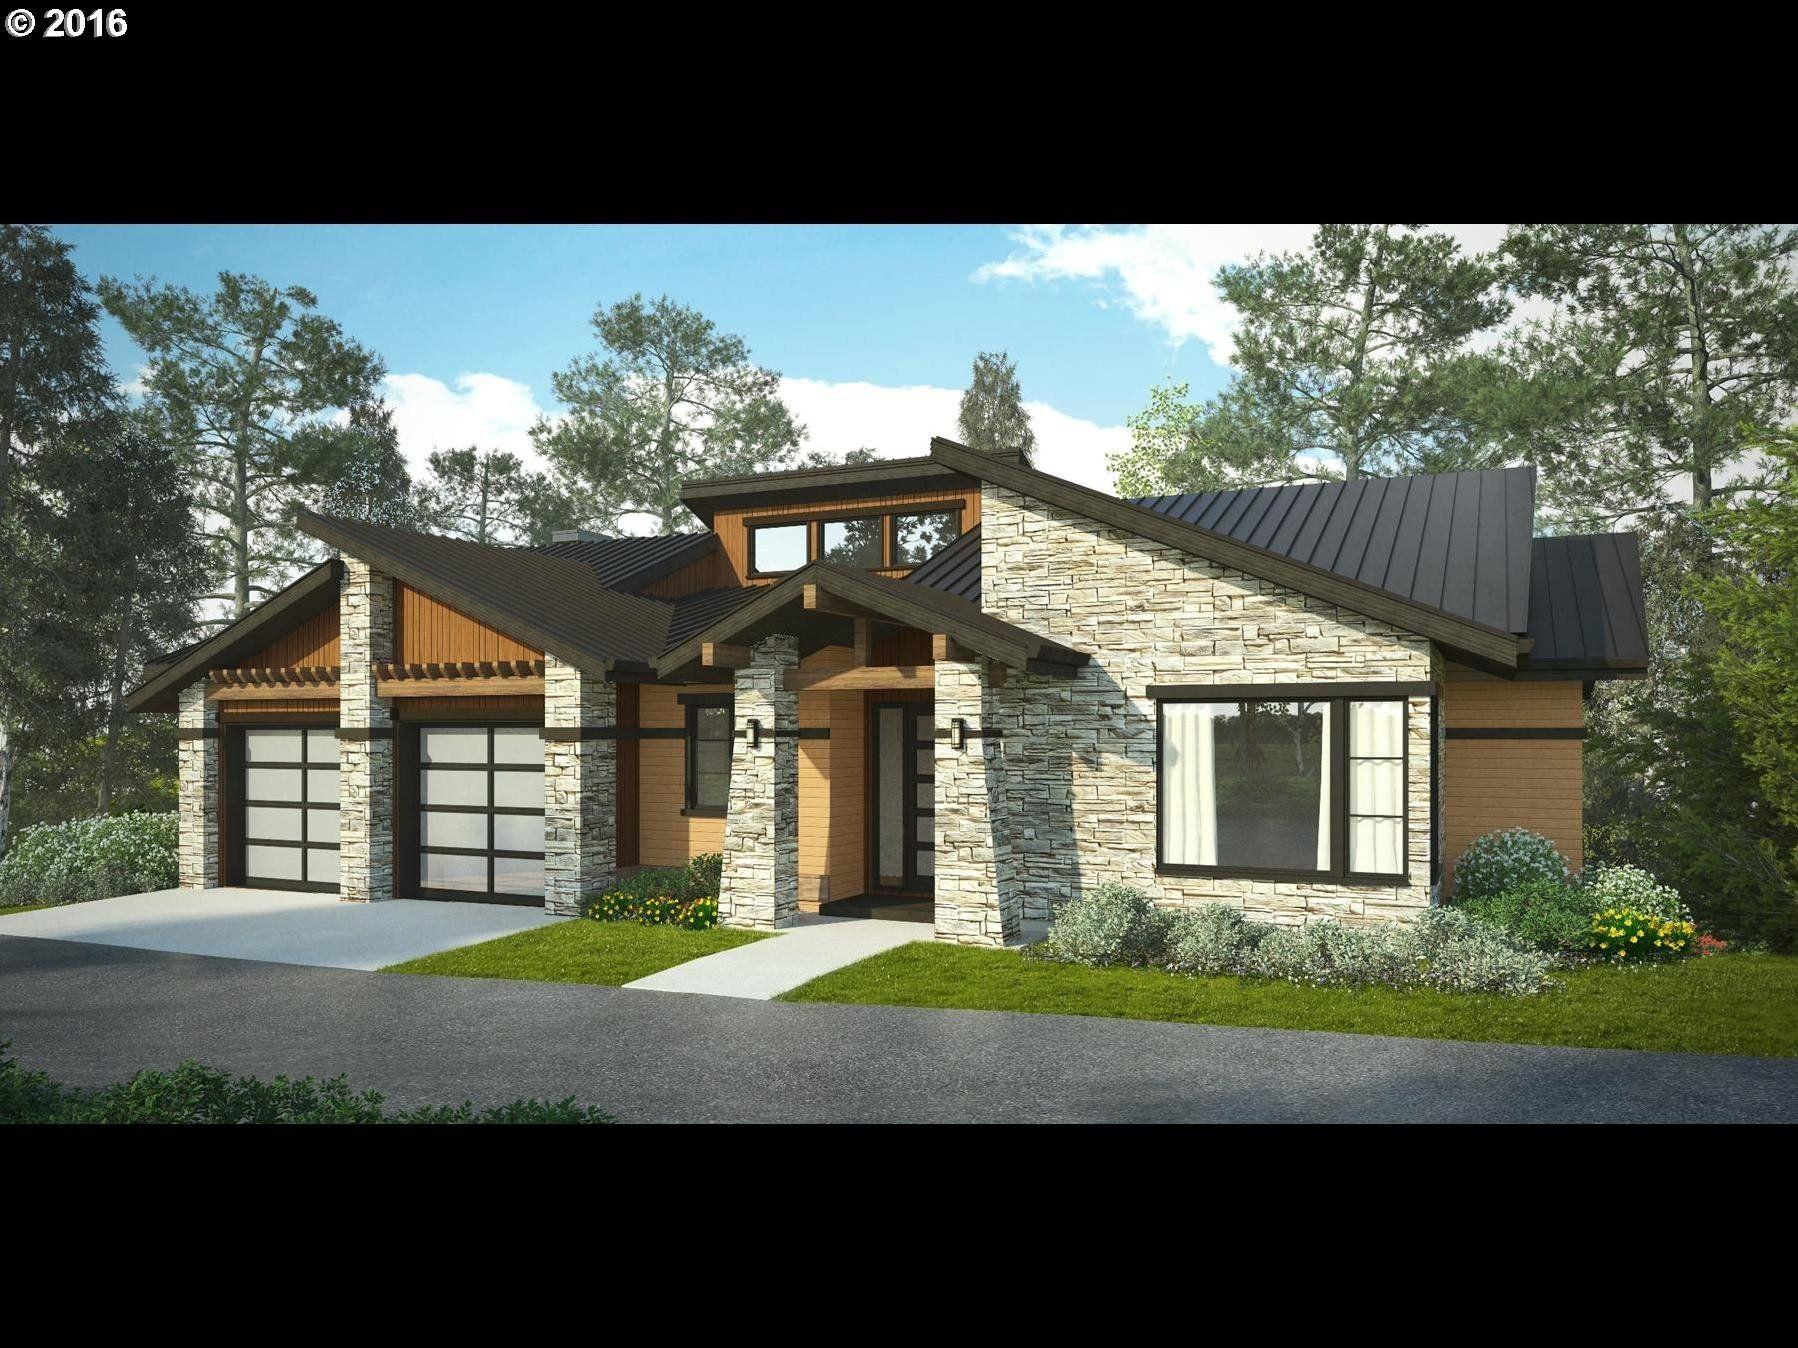 Sold or expired (62054939) Lake oswego, Modern homes for